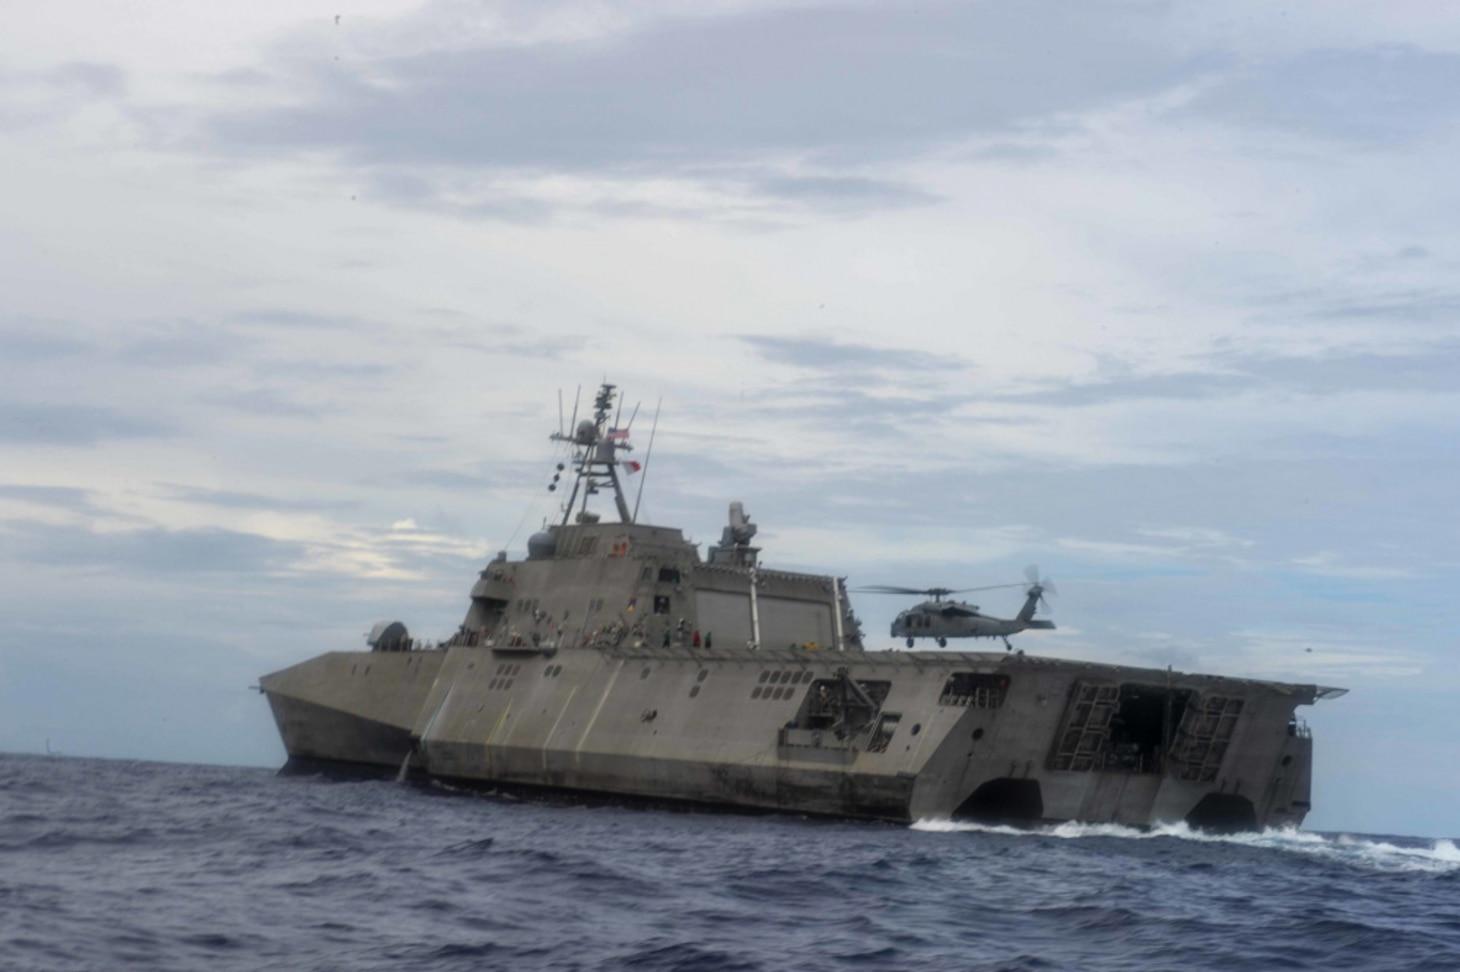 USS Tulsa (LCS 16) underway